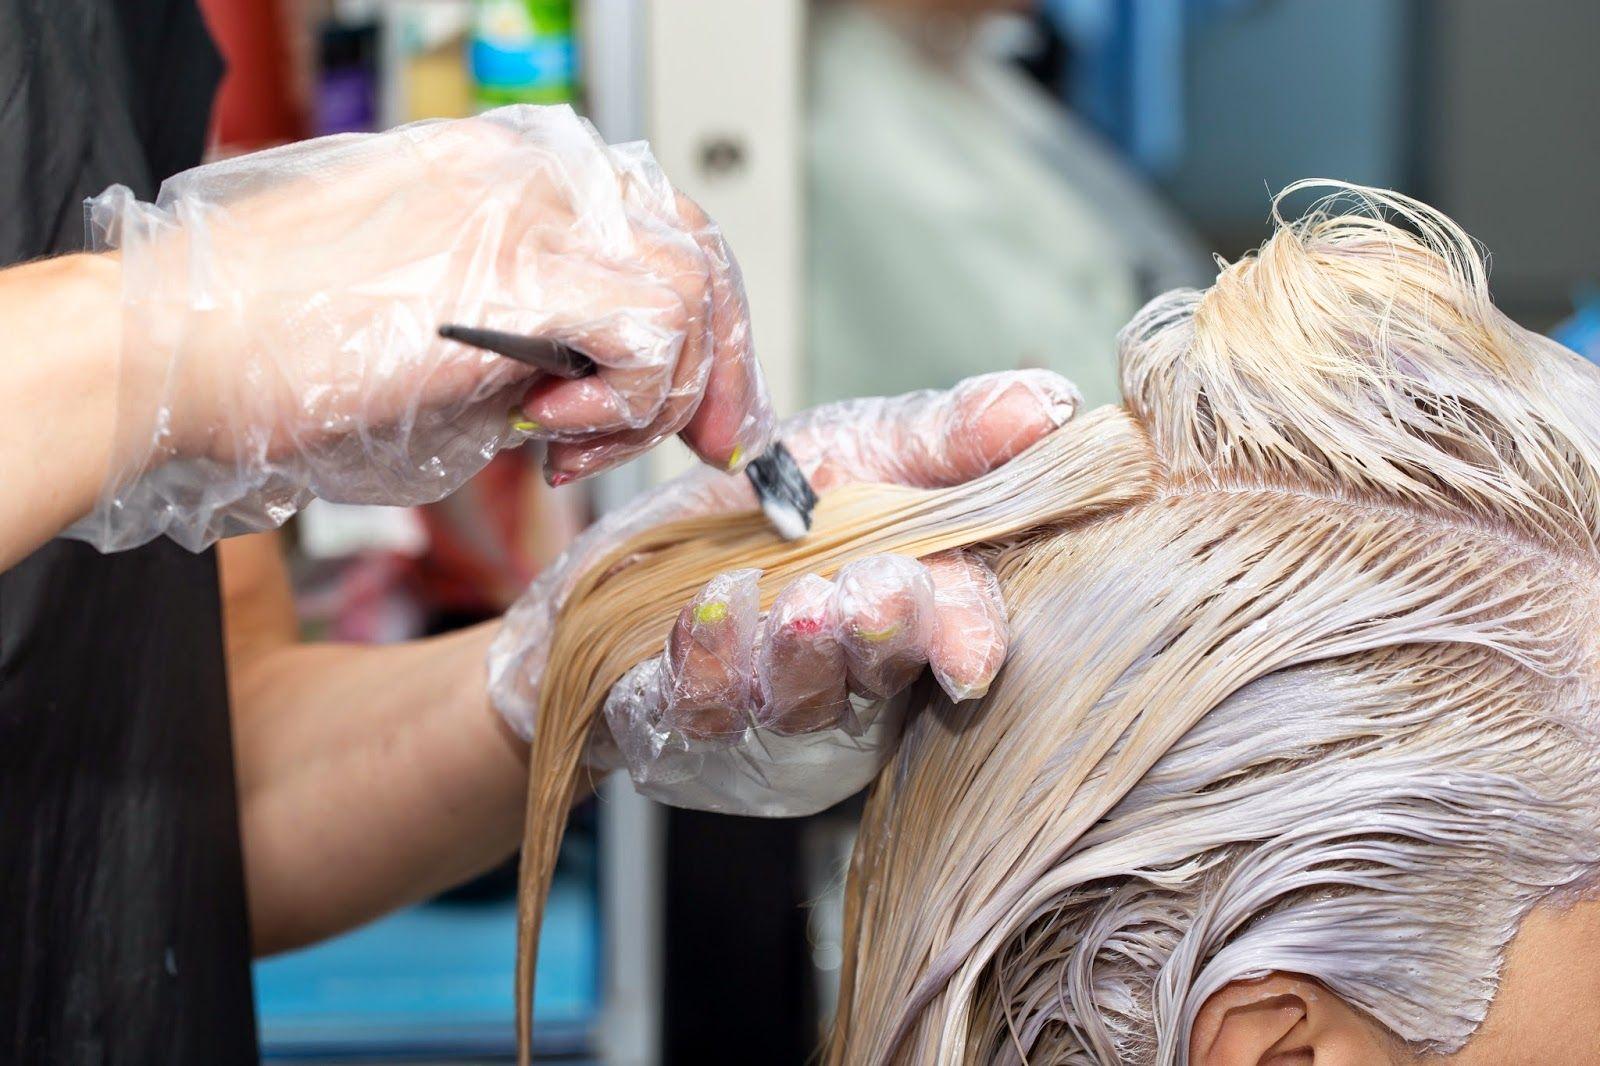 Как покрасит корни волос в домашних условиях 96